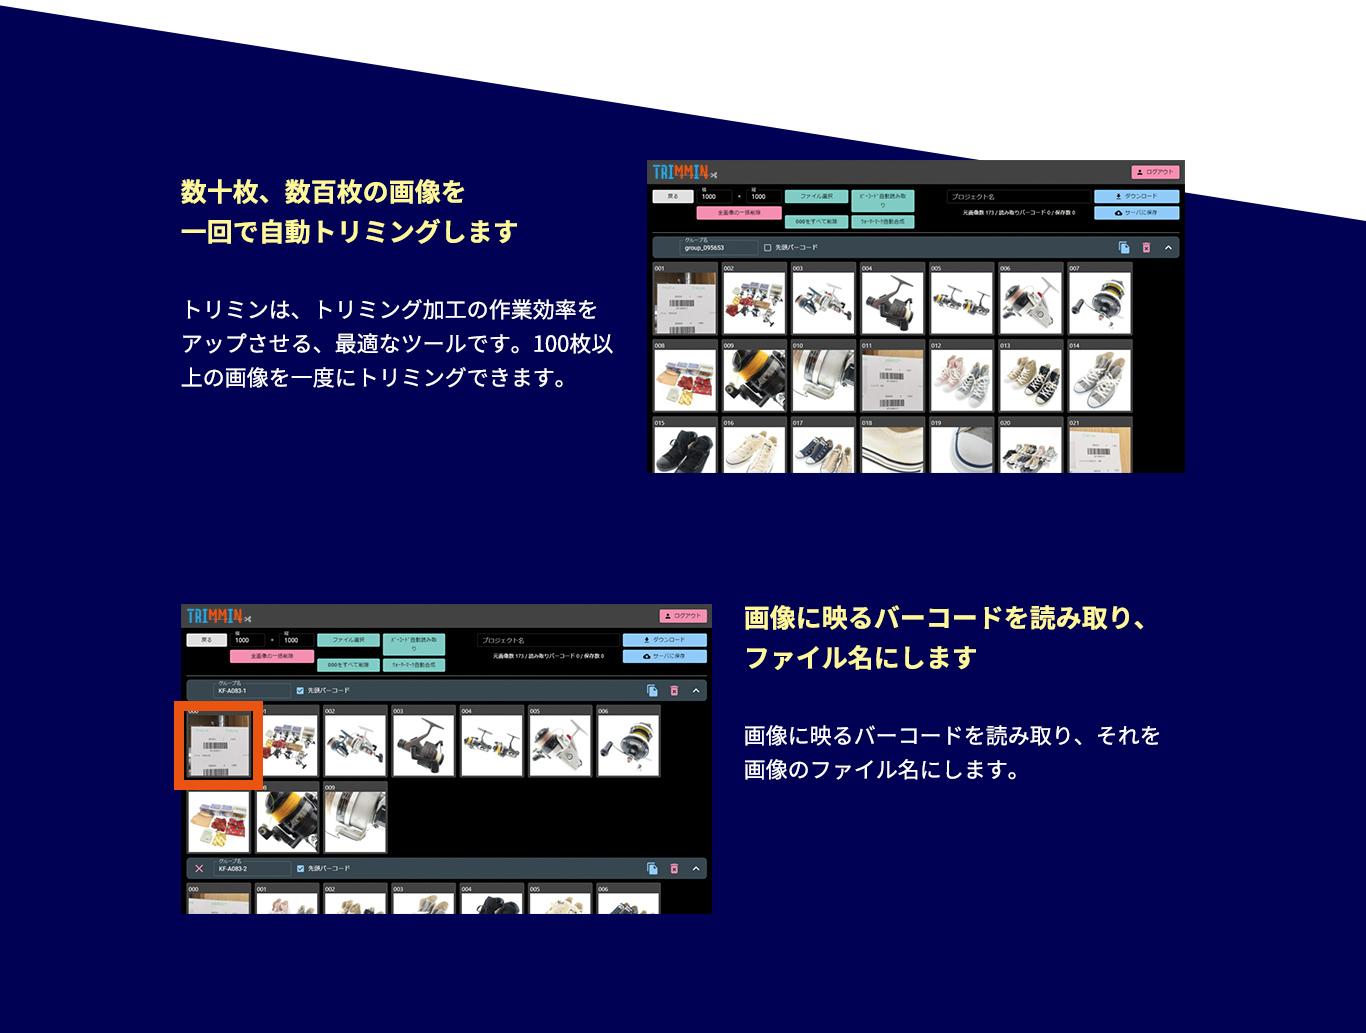 TRIMMIN-PC_3.jpg